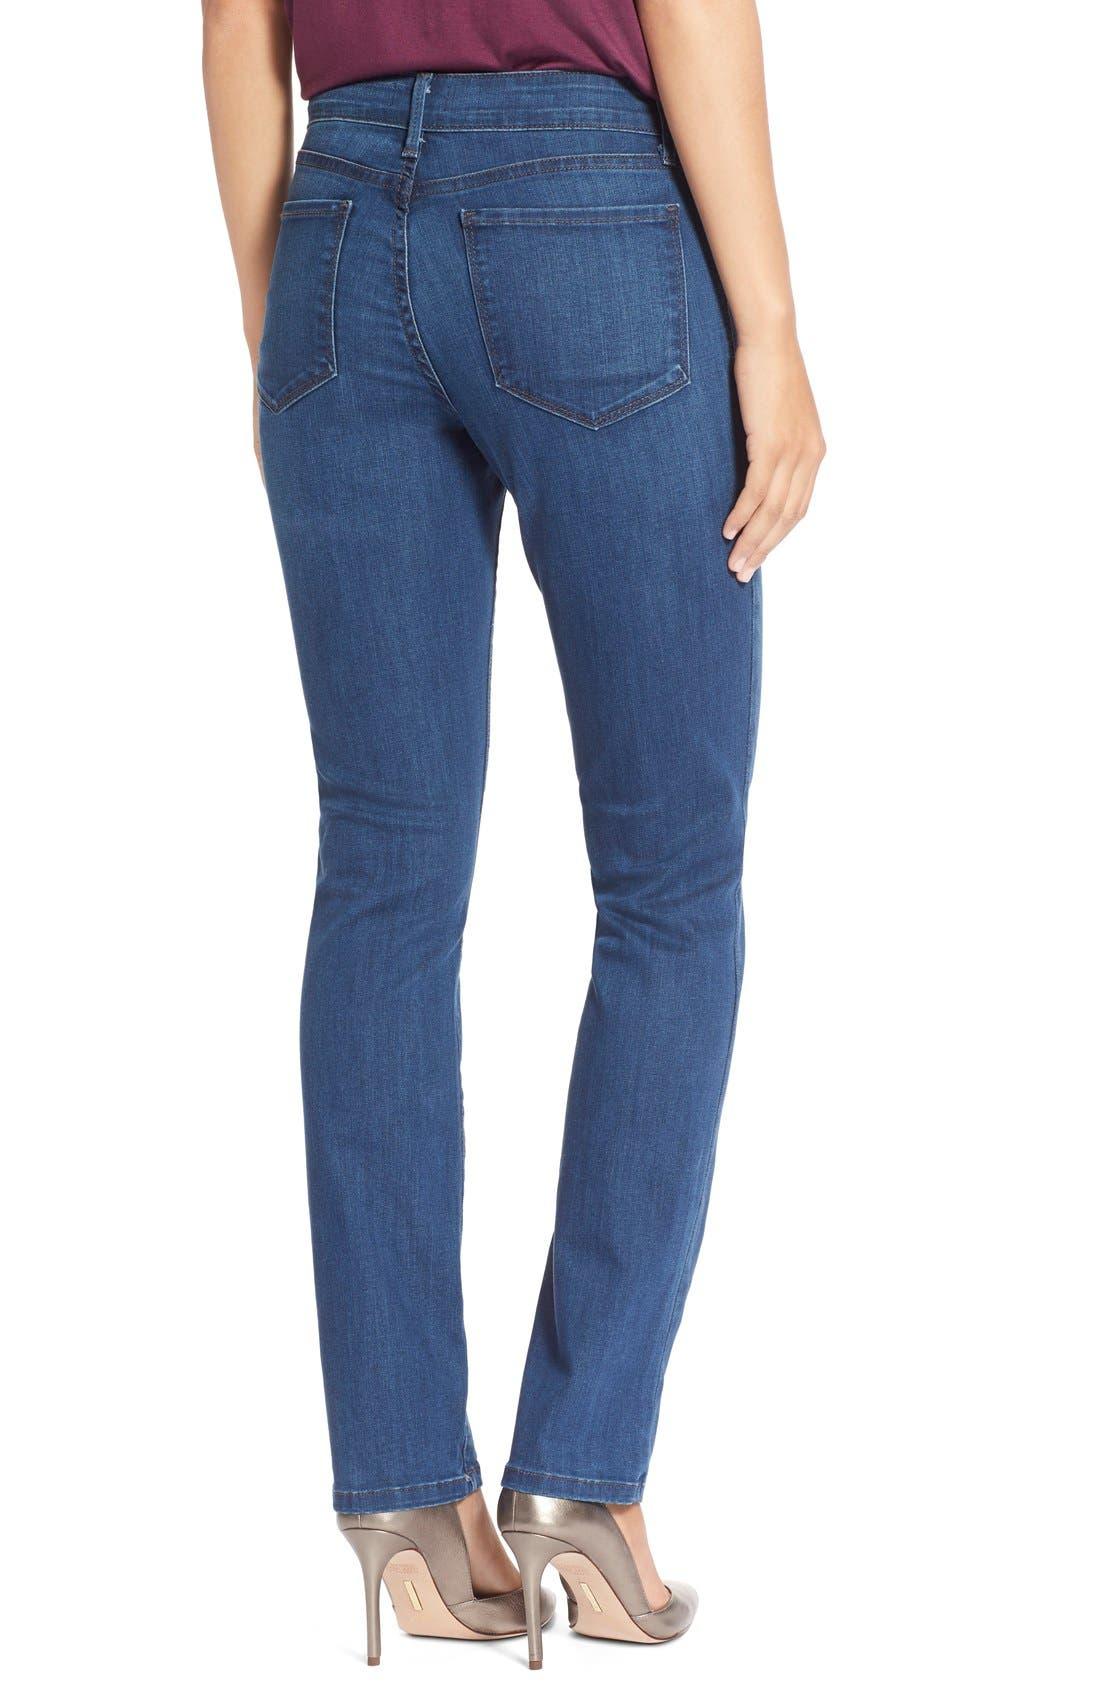 Alternate Image 2  - NYDJ'Sheri' Stretch Skinny Jeans (Valencia)(Petite)